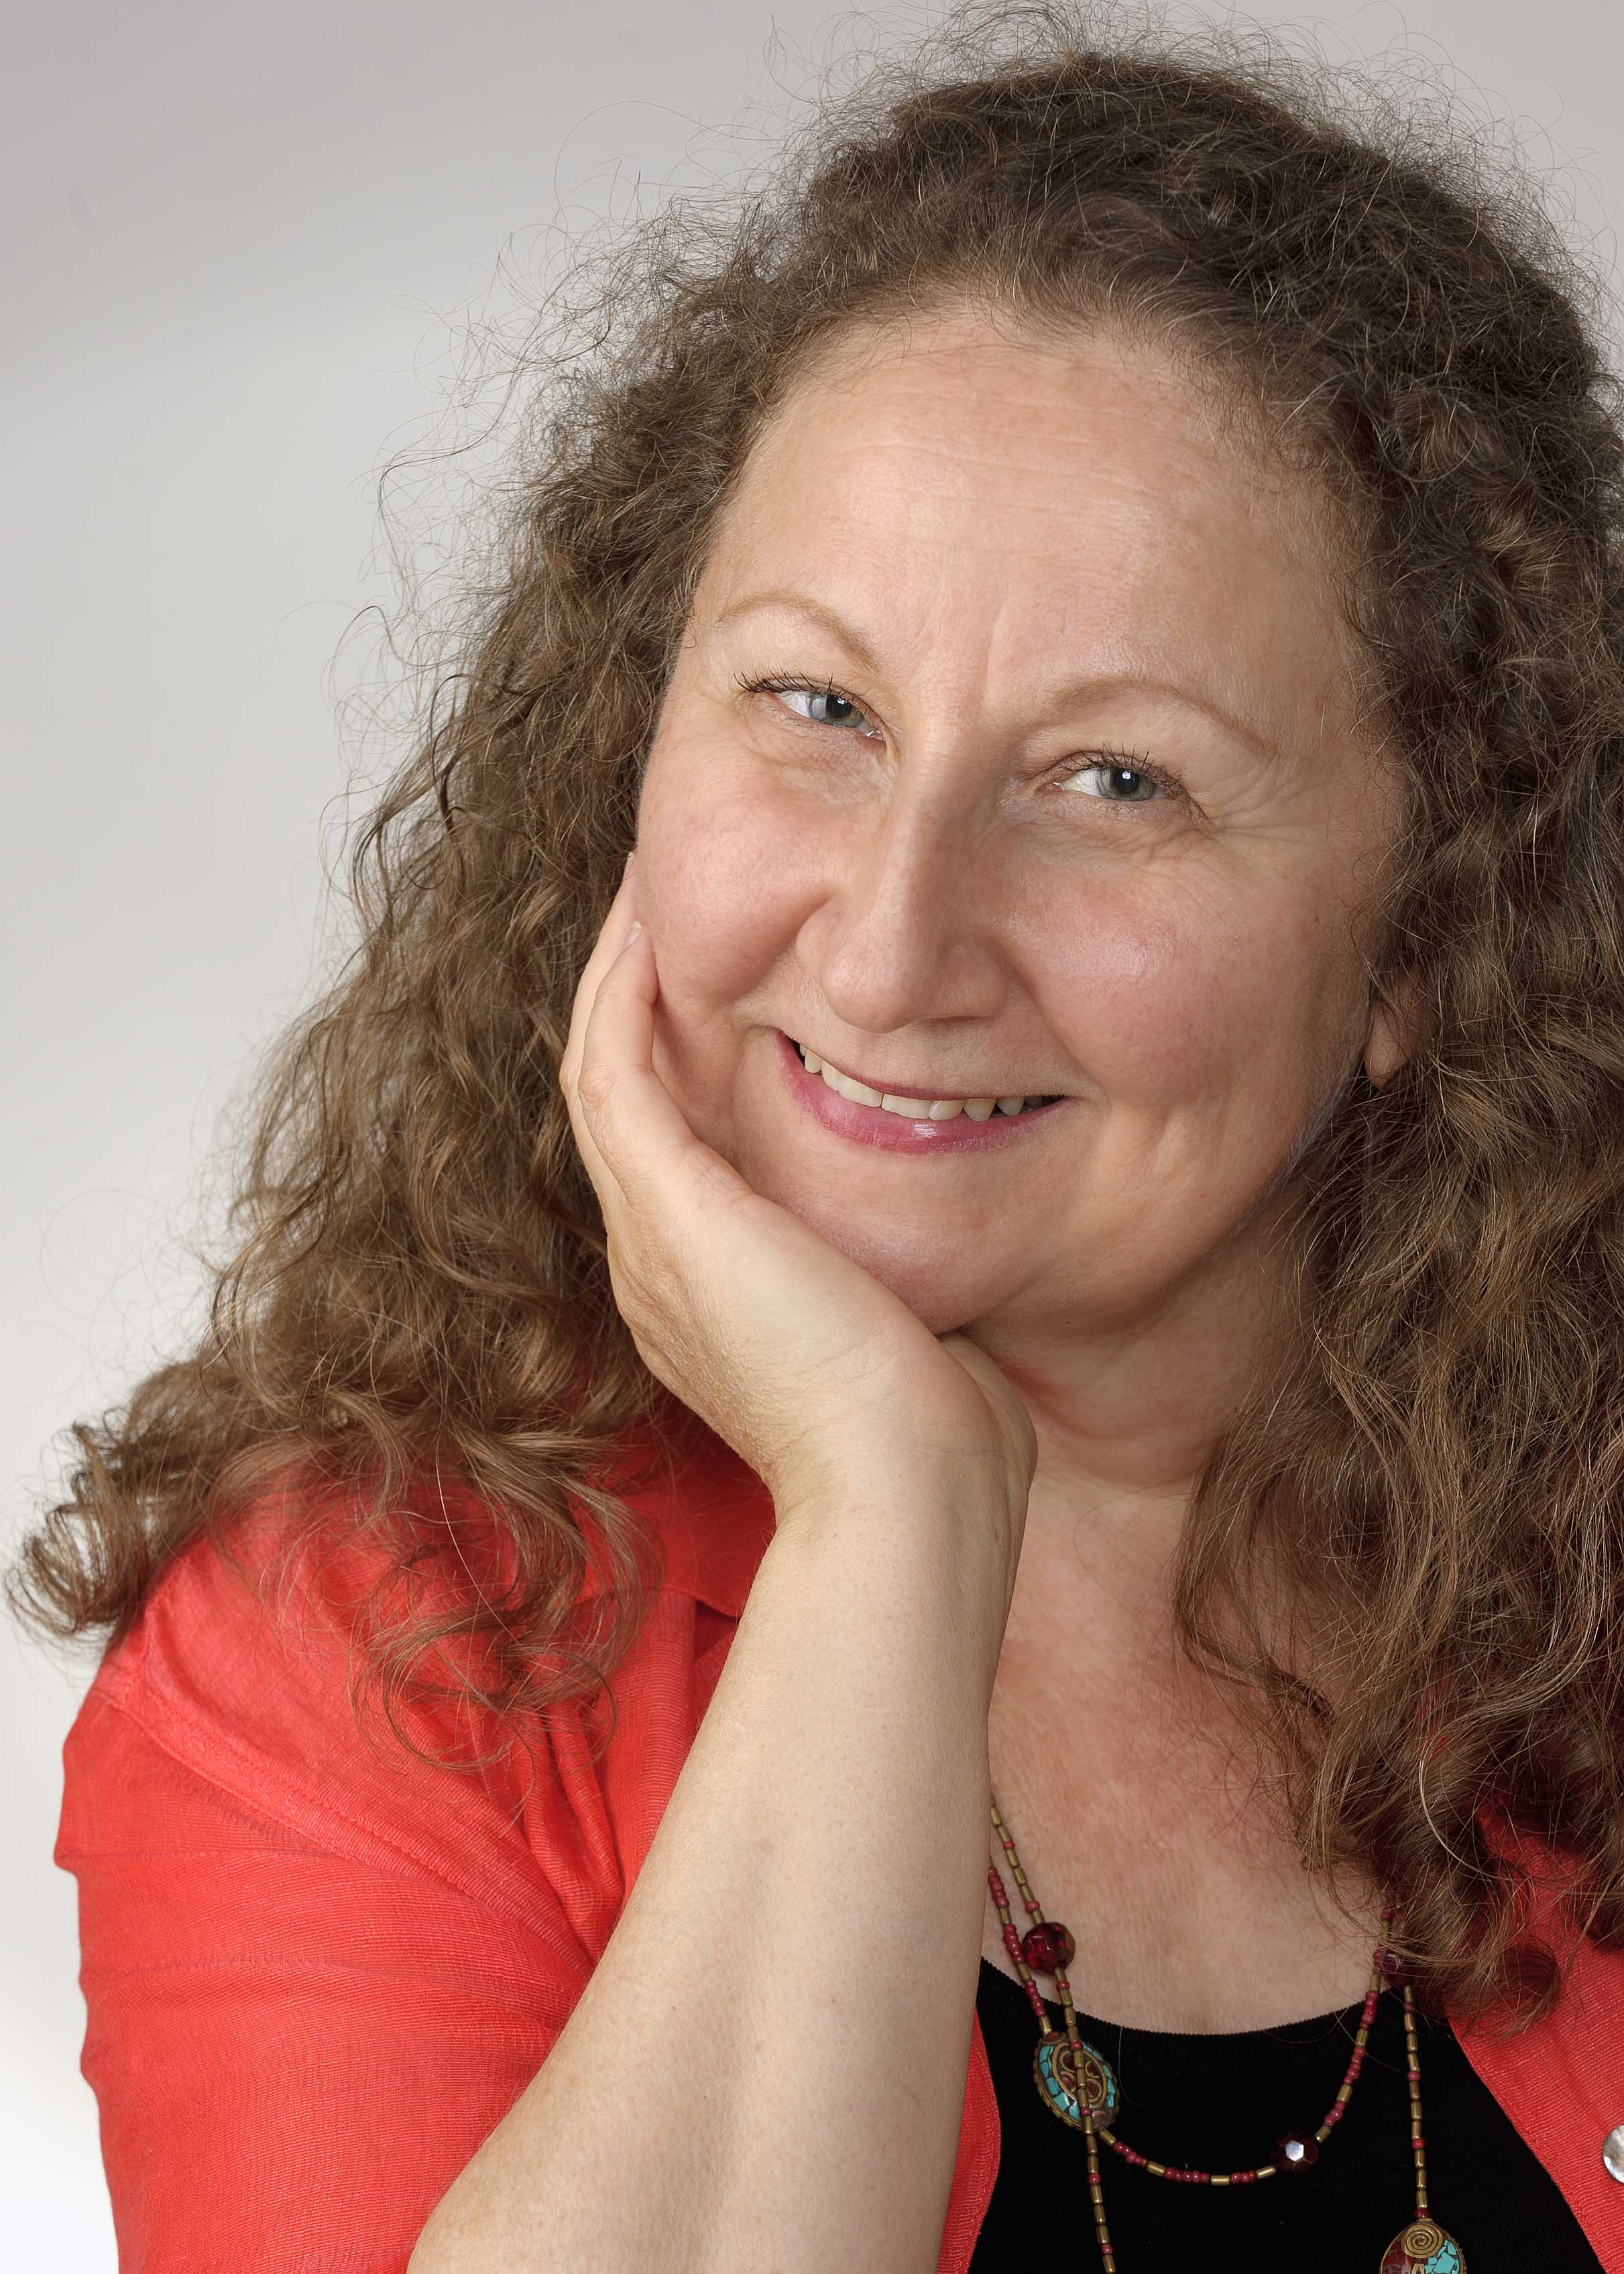 Dance Stronger: An Interview With Monika Volkmar